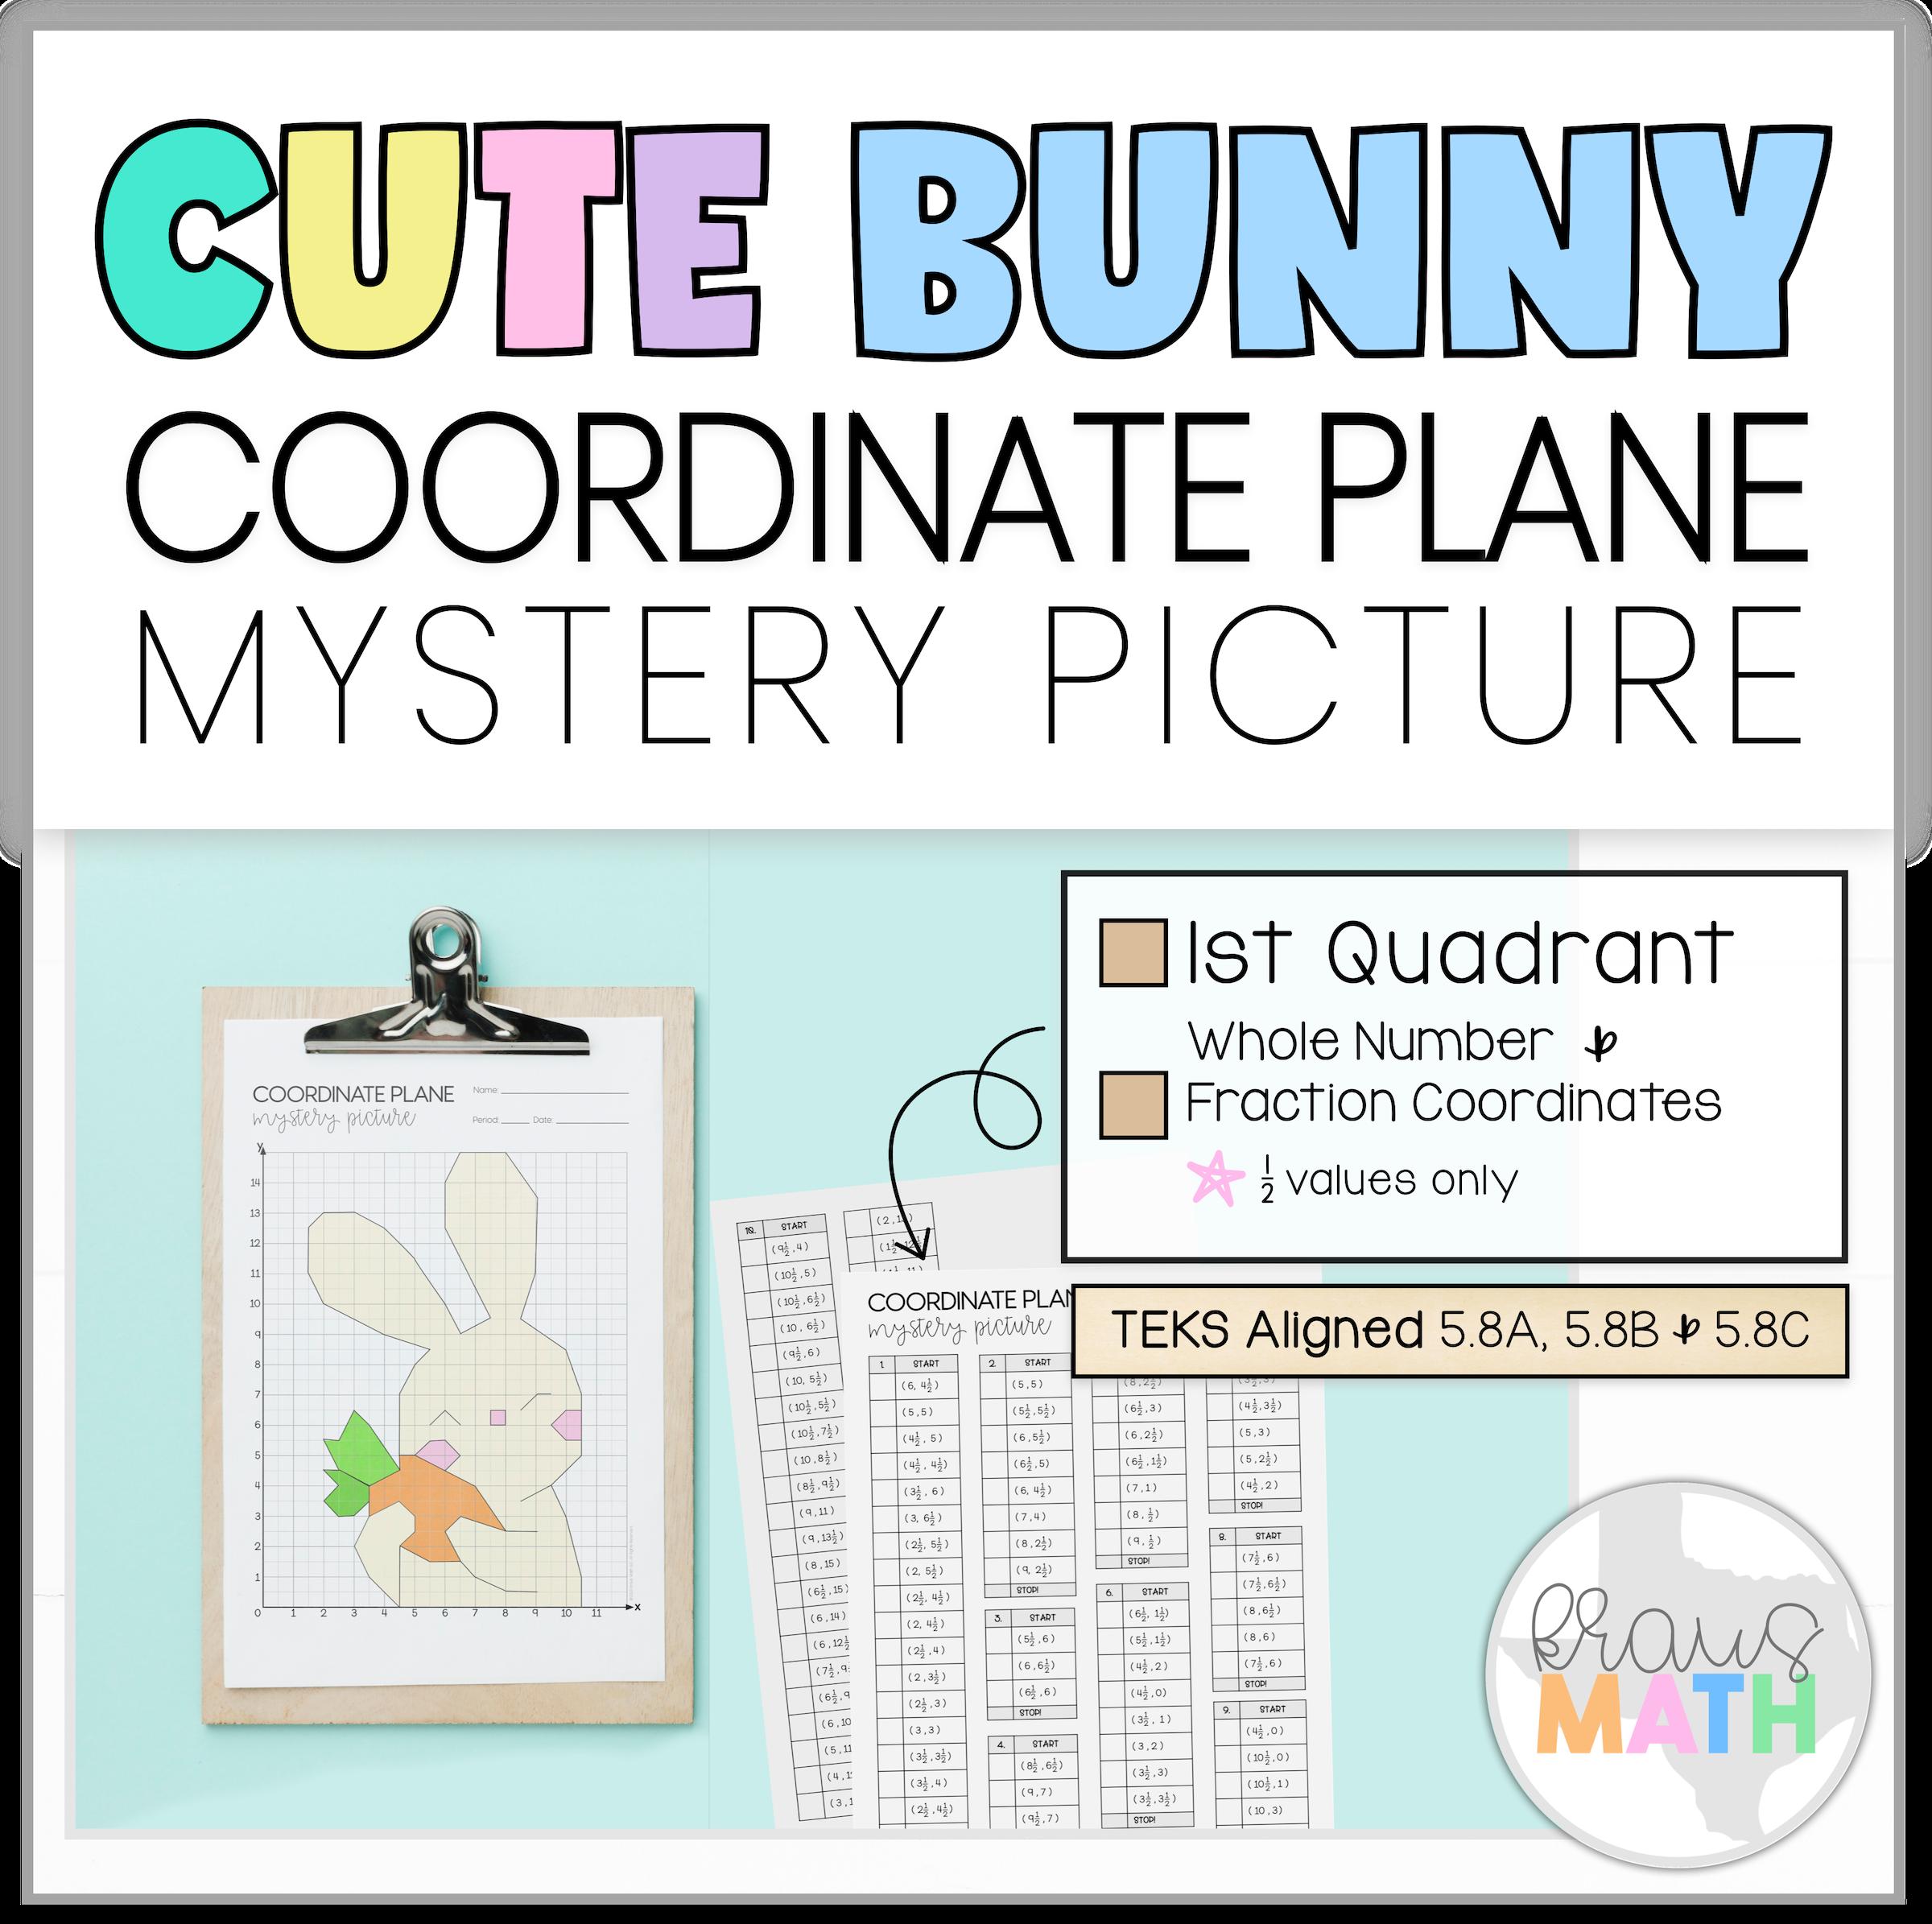 Cute Bunny Coordinate Plane Mystery Picture 1st Quadrant